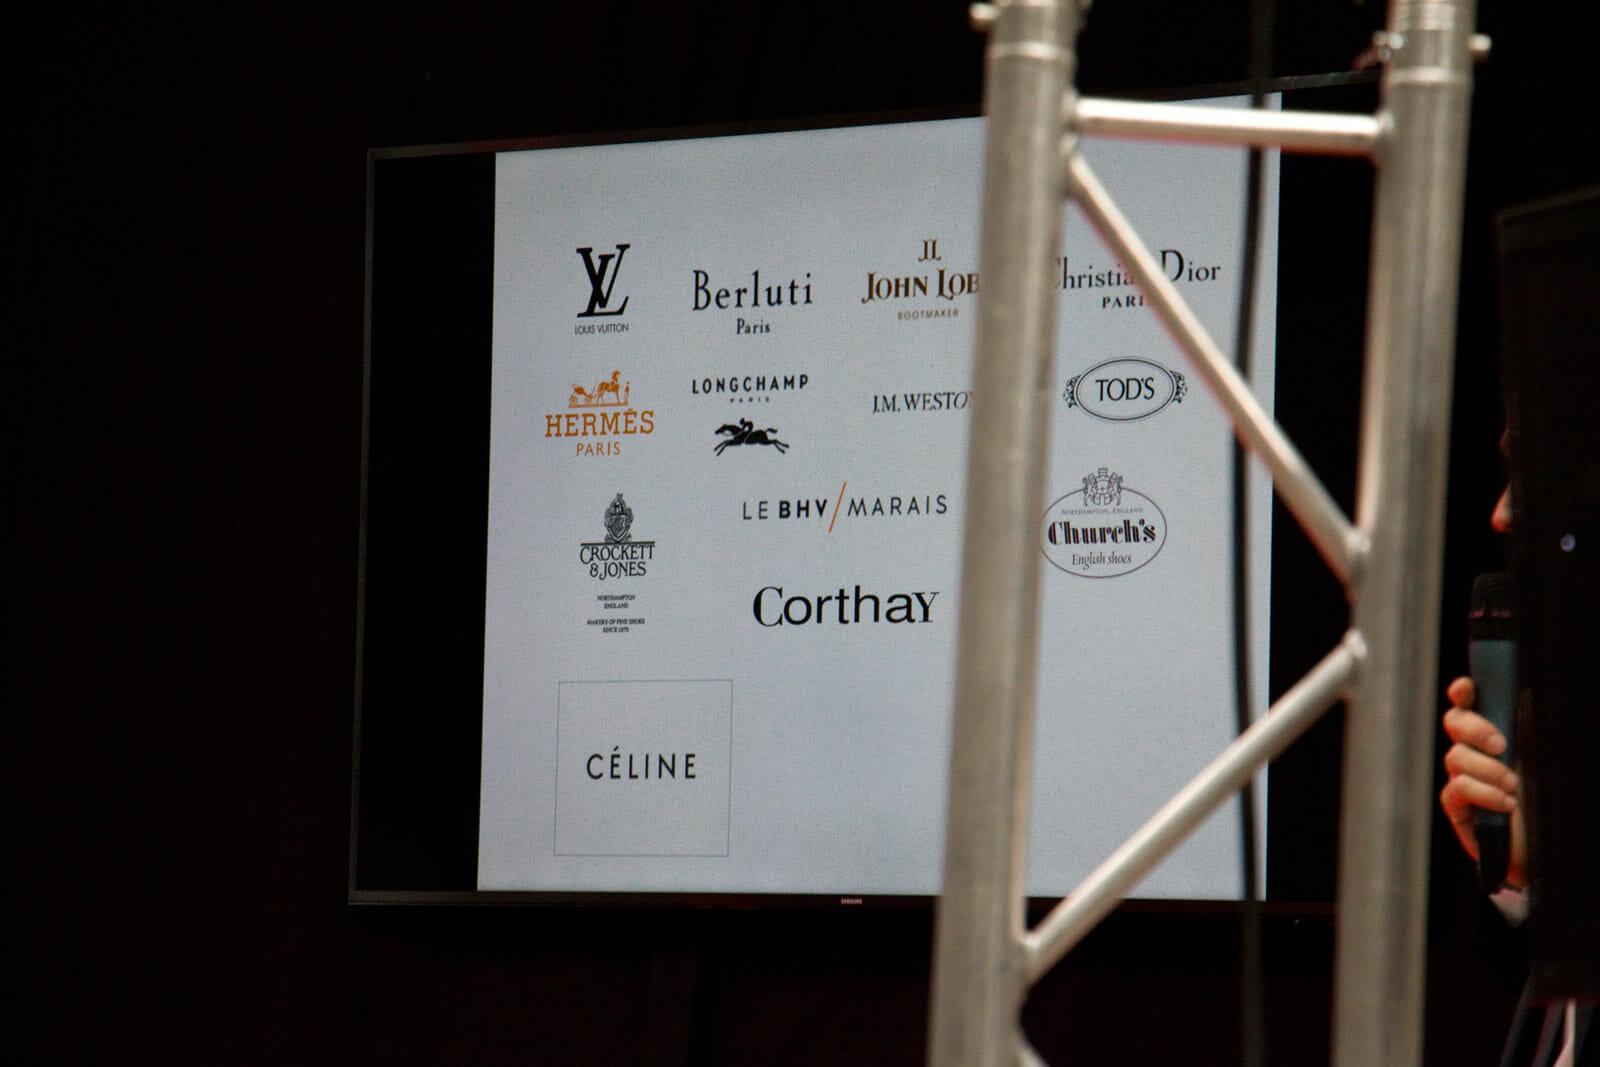 Louis Vuitton, Hermes, Berluti, Church współpracują z Saphir